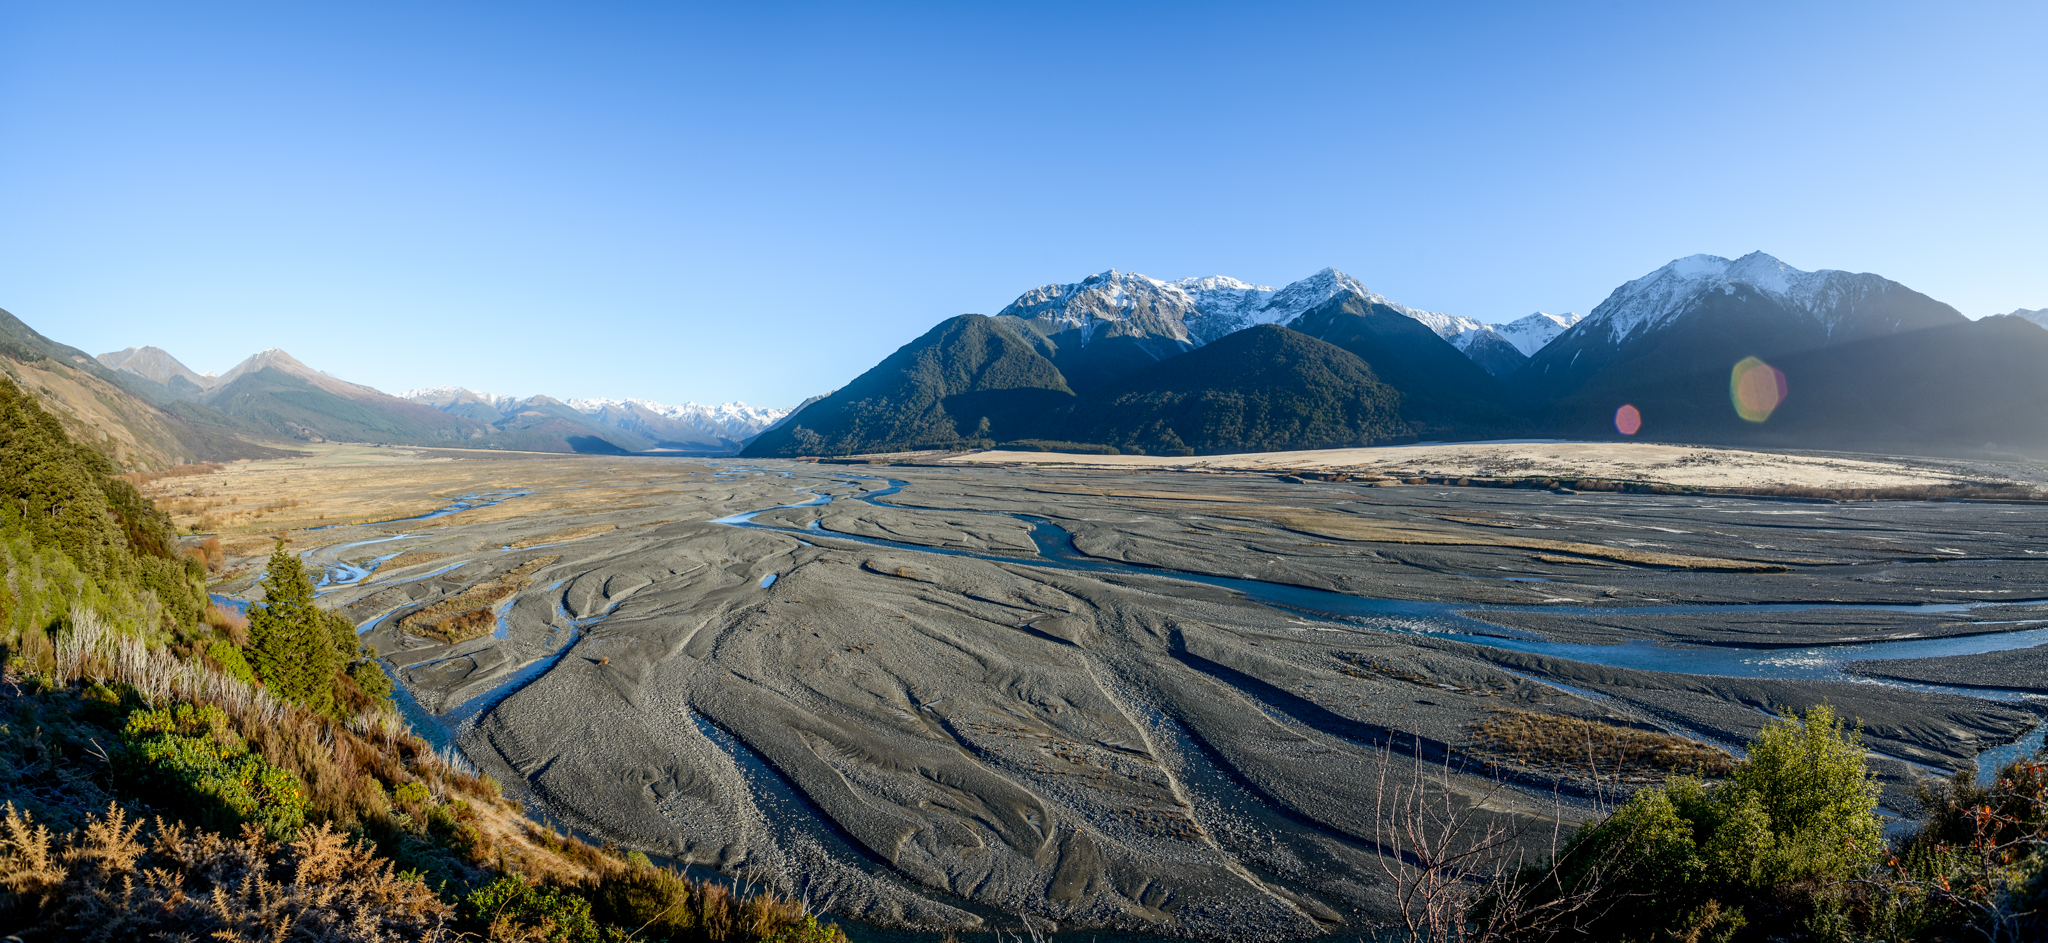 Waimakariri River from Paddy's Bend